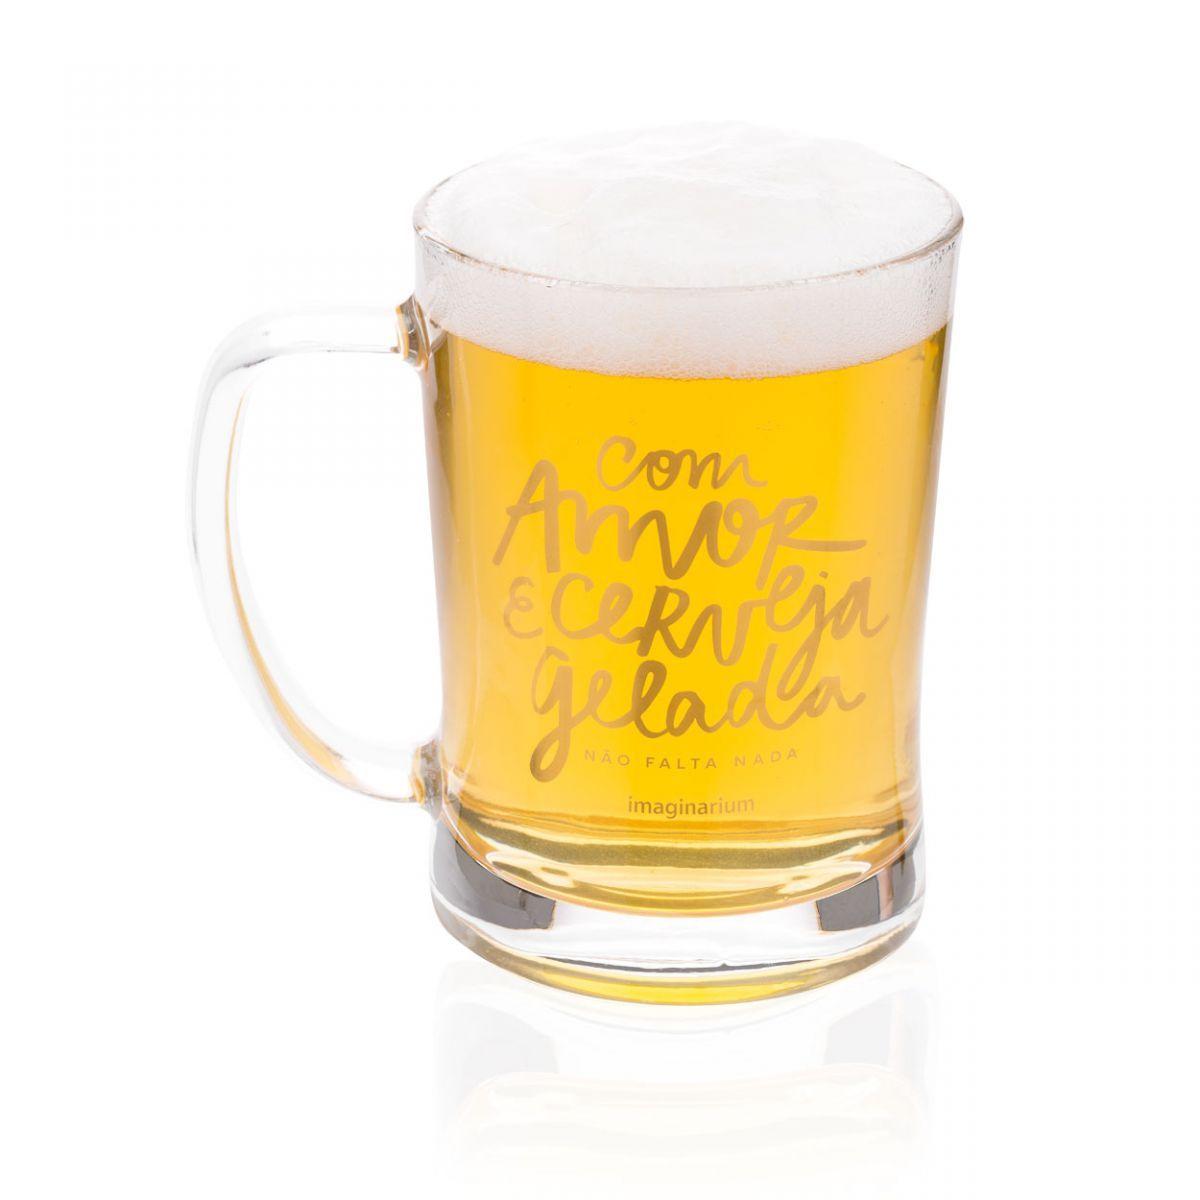 Famosos Kit cerveja gelada e amor - Imaginarium VI42